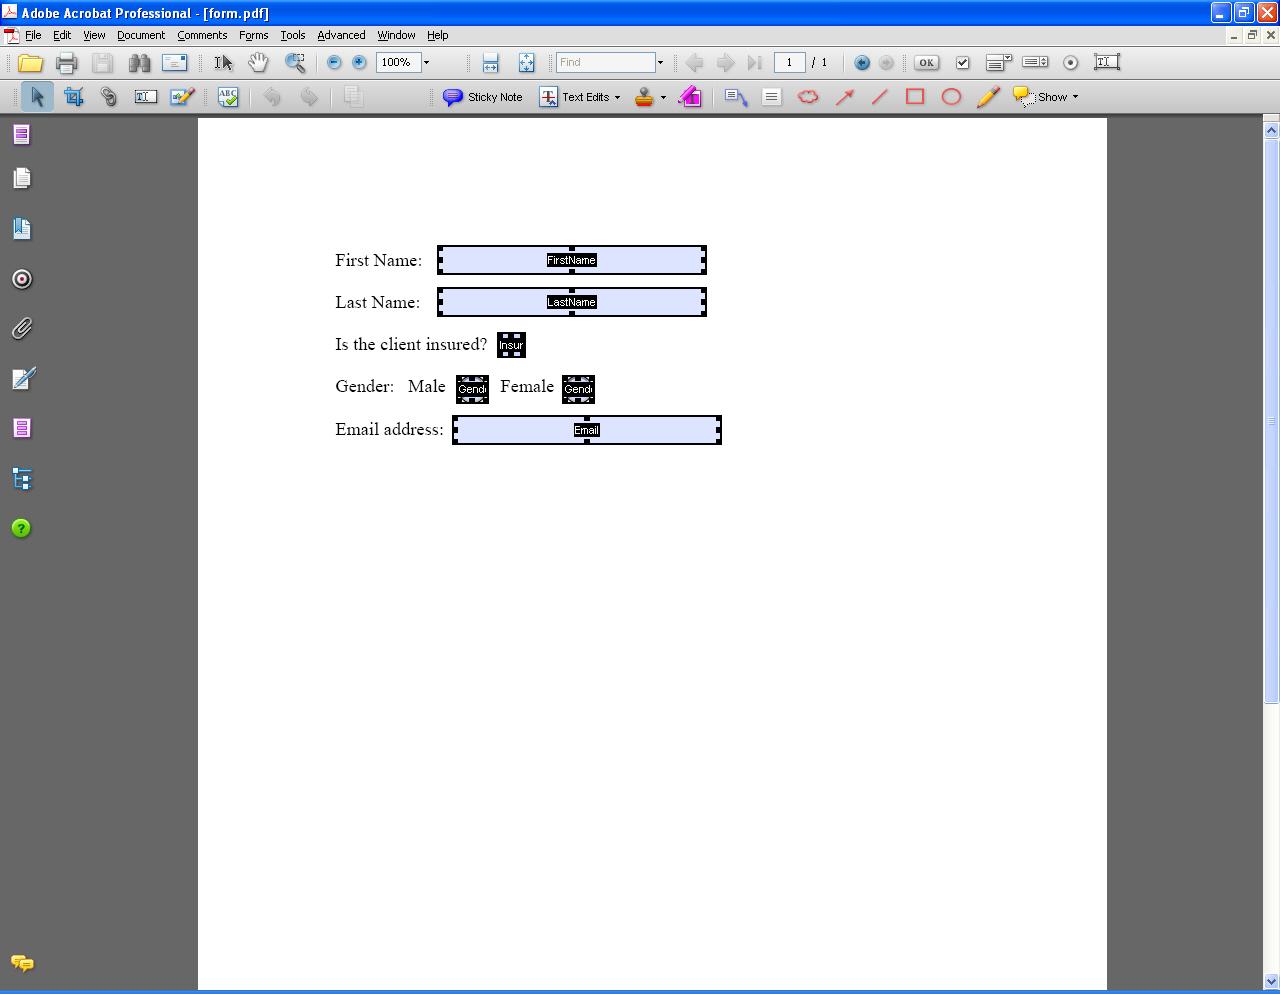 Custom-made Adobe Scripts: Acrobat -- Mail Merge and Email